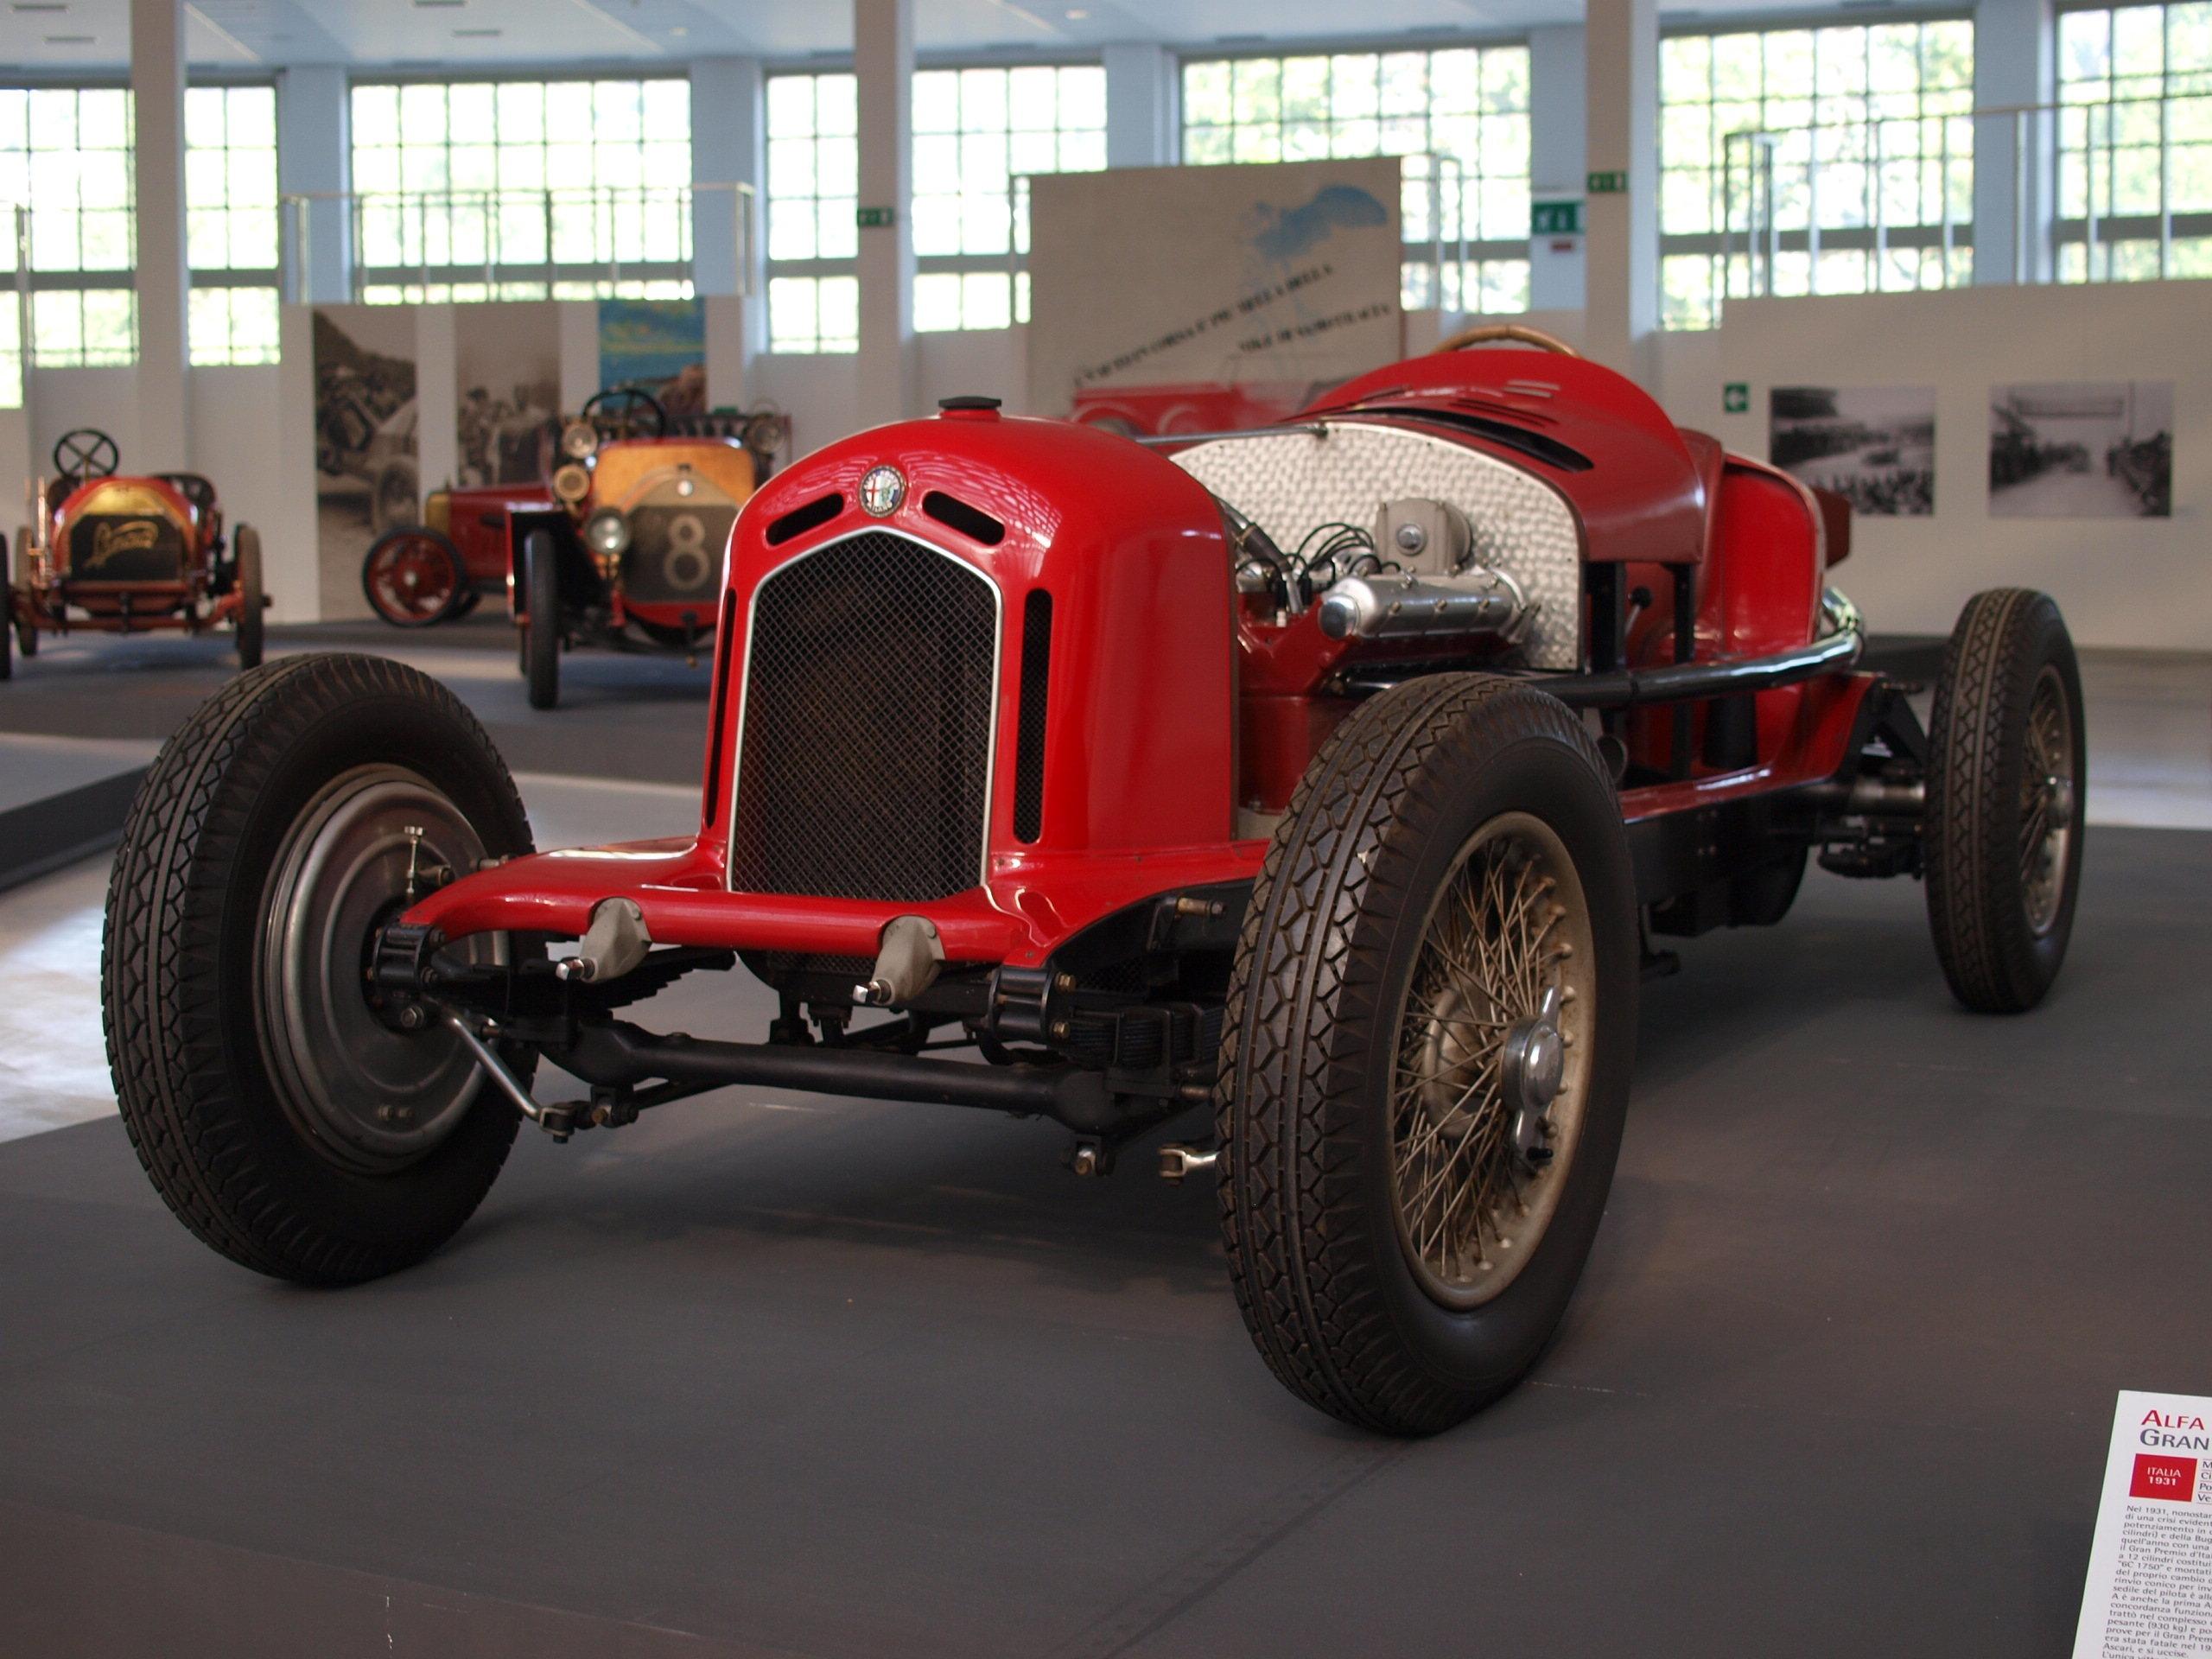 http://upload.wikimedia.org/wikipedia/commons/8/88/Alfa_Romeo_Gran_Premio_tipo_A_1931.jpg